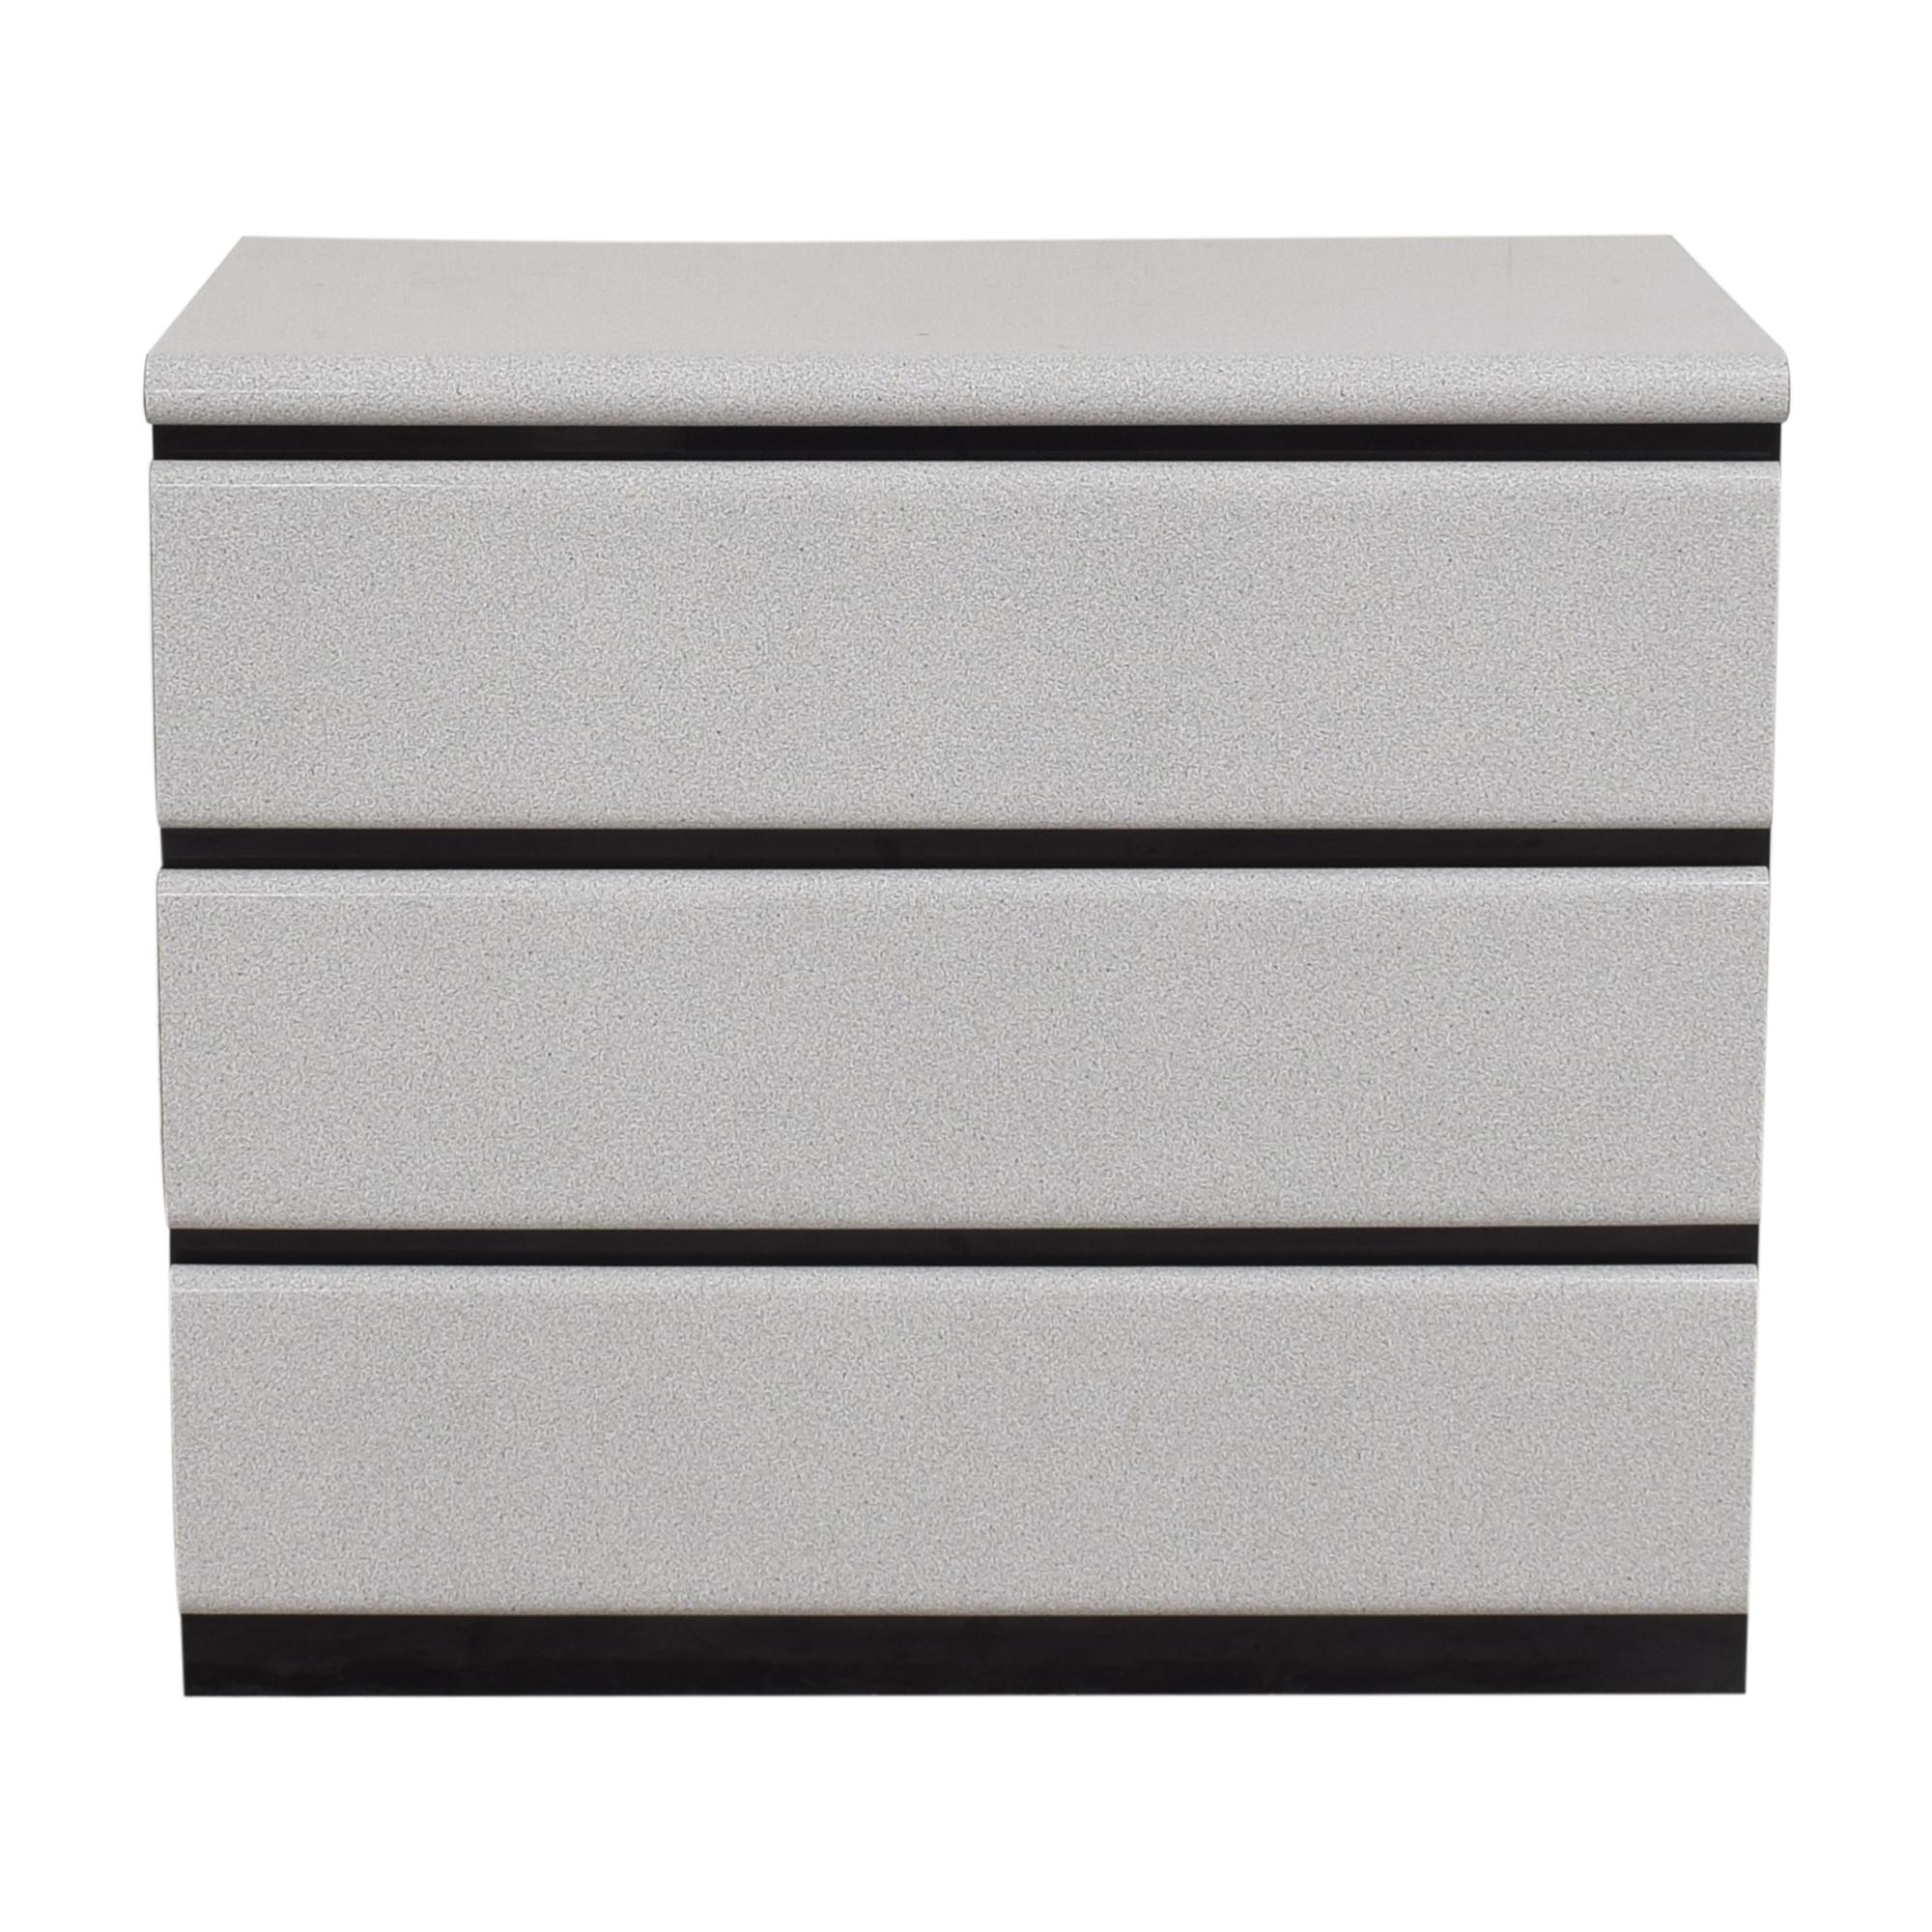 Benson's Custom Furniture Benson's Custom Furniture Three Drawer Dresser dimensions